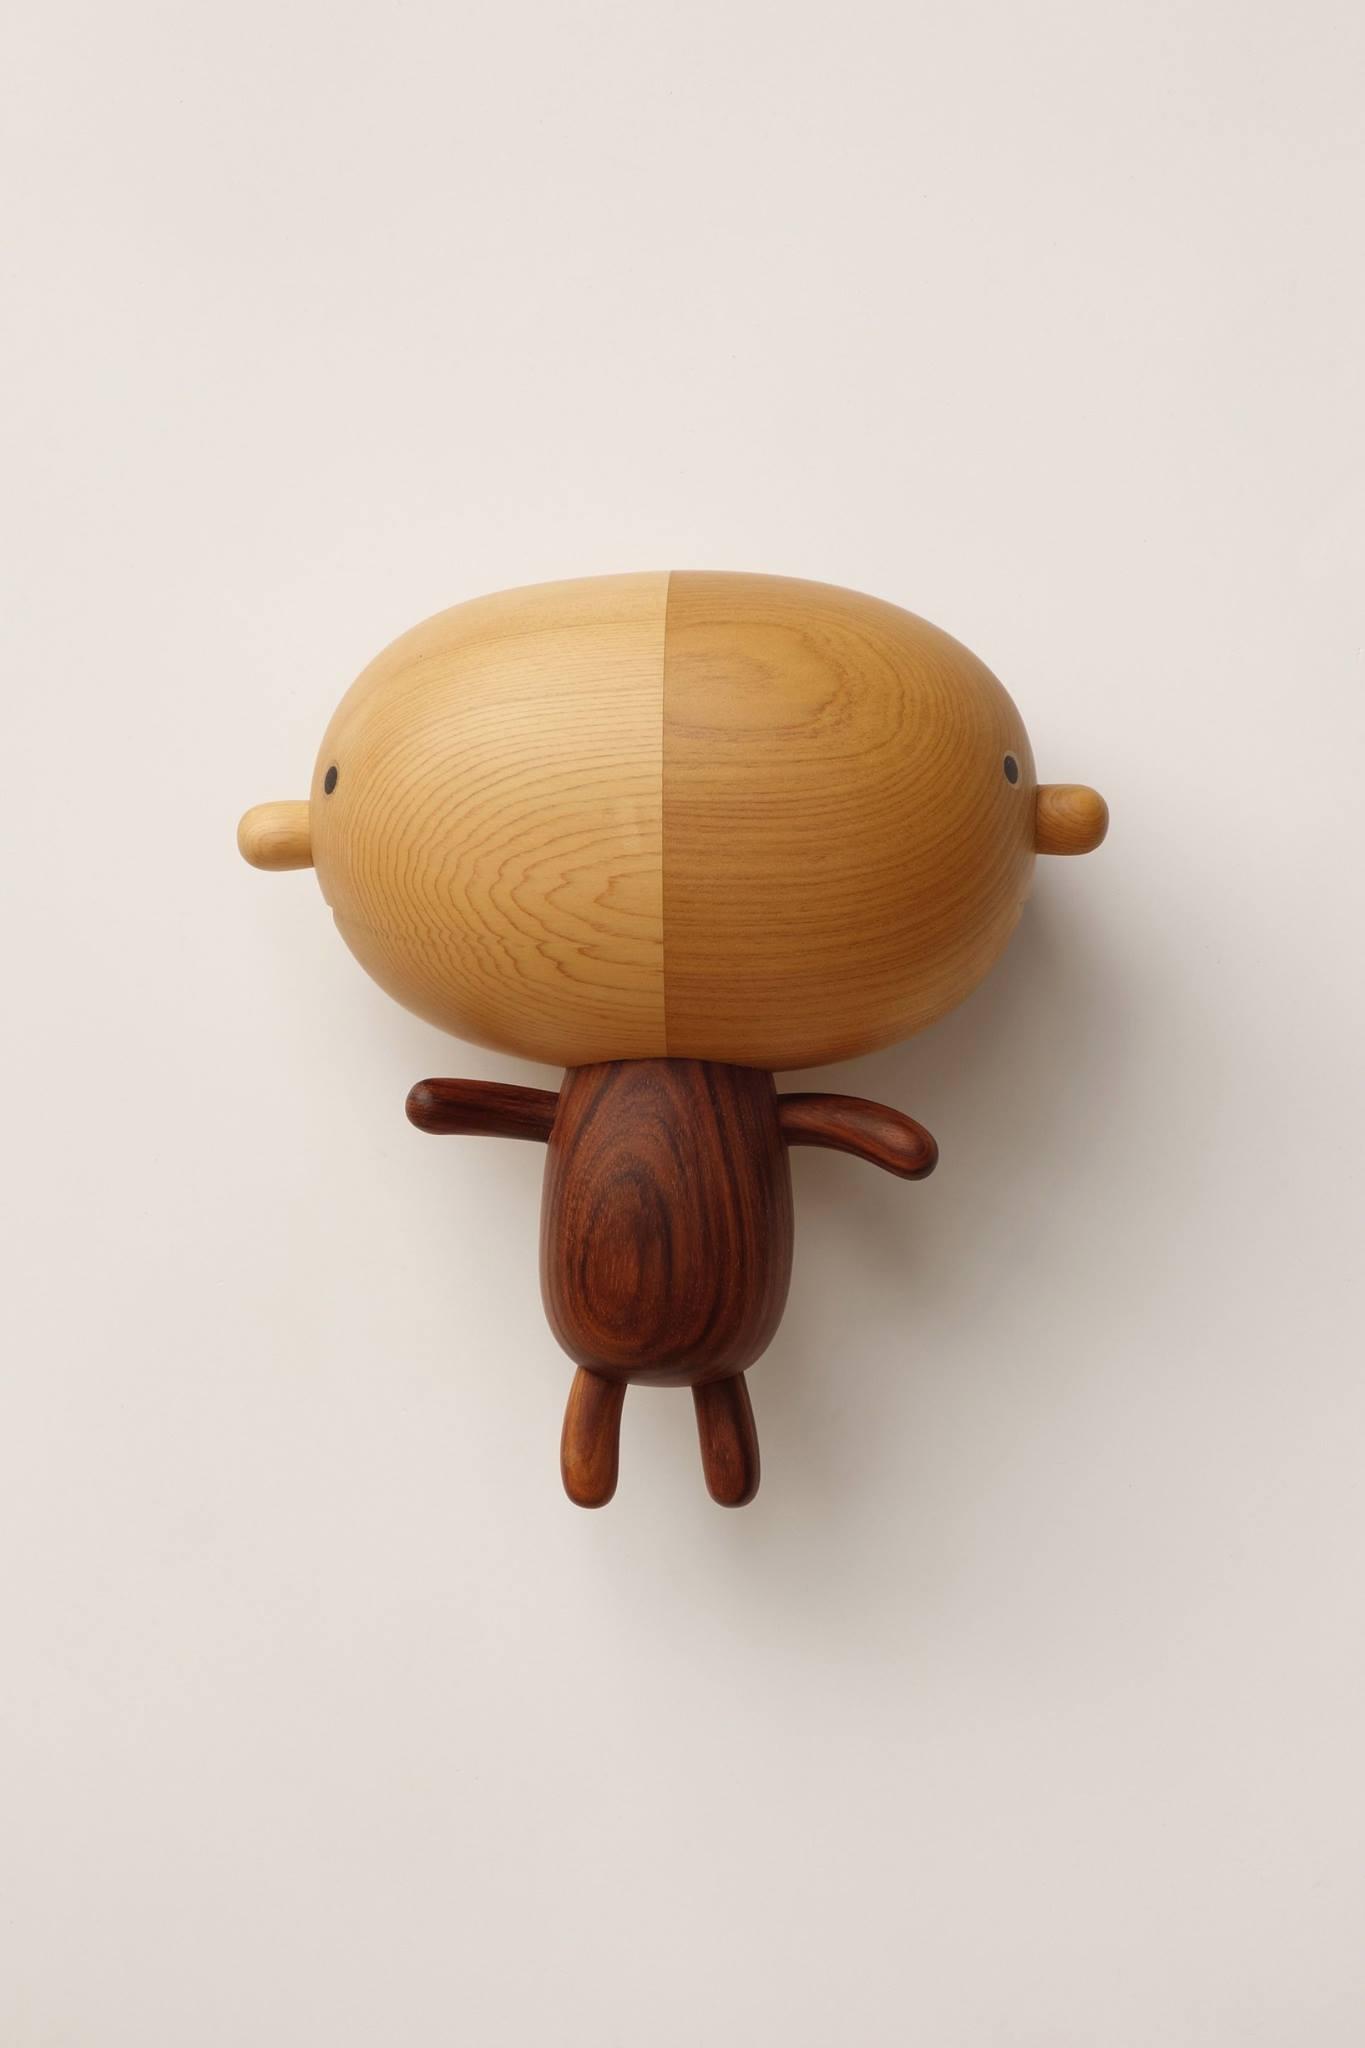 yen jui-lin madera mis gafas de pasta03